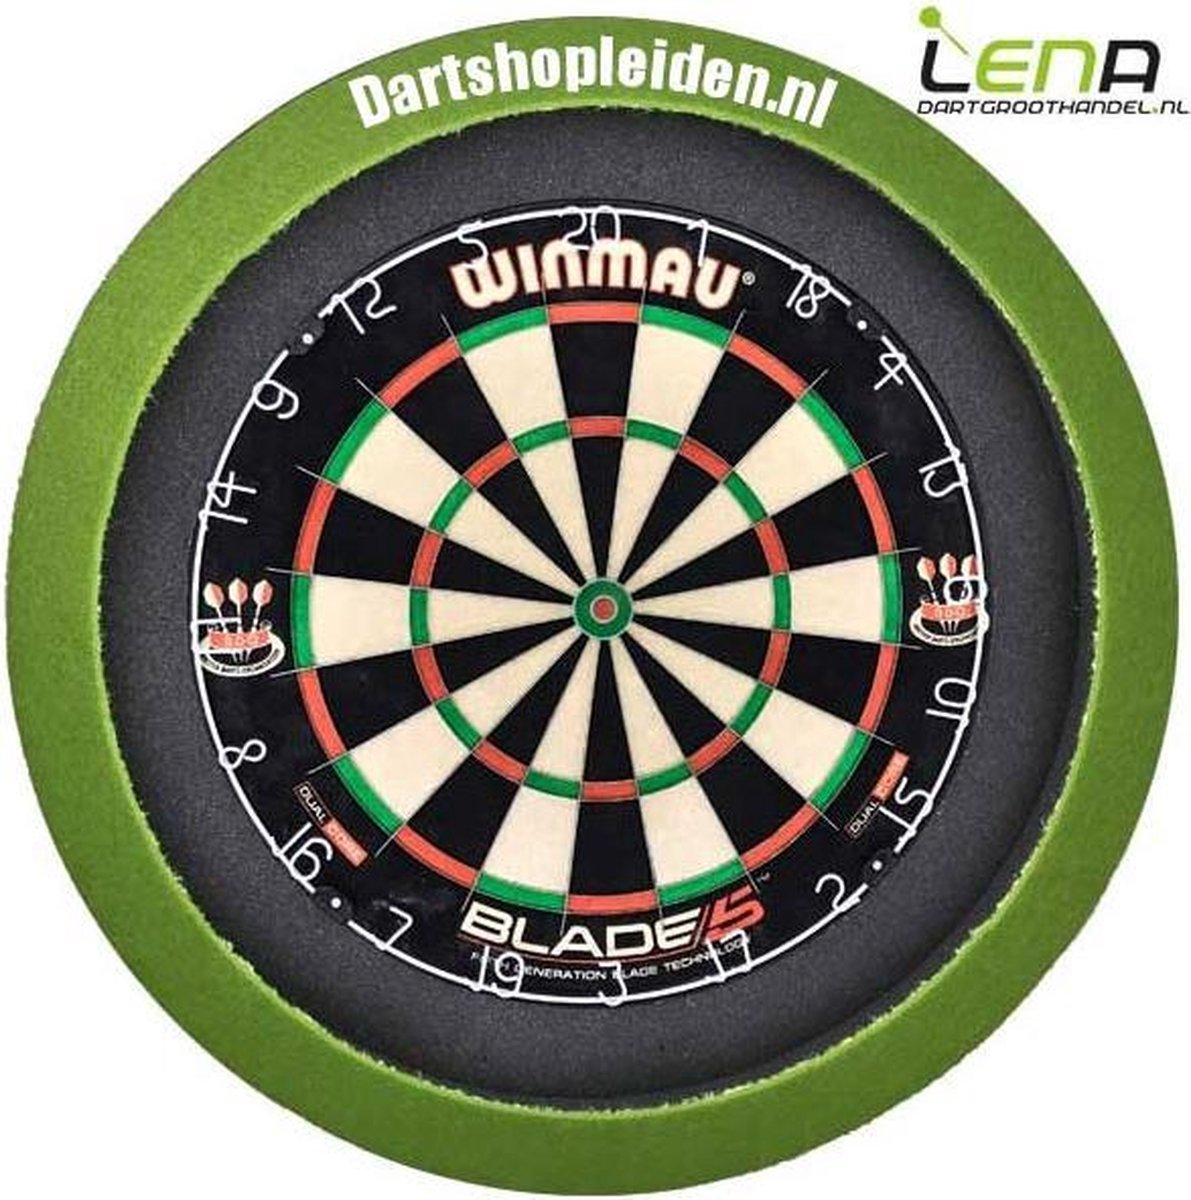 LENA Dartbord Verlichting BASIC (Lime)